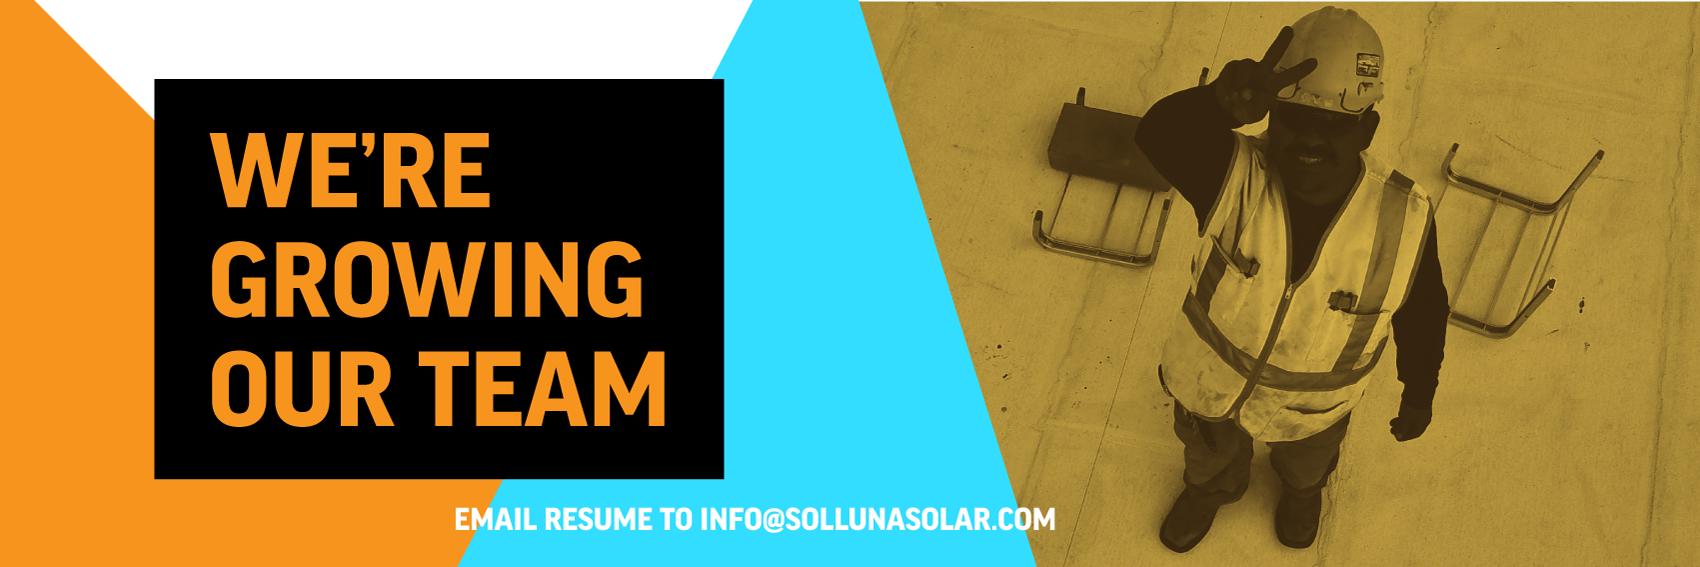 Career Opportunities at Sol Luna Solar